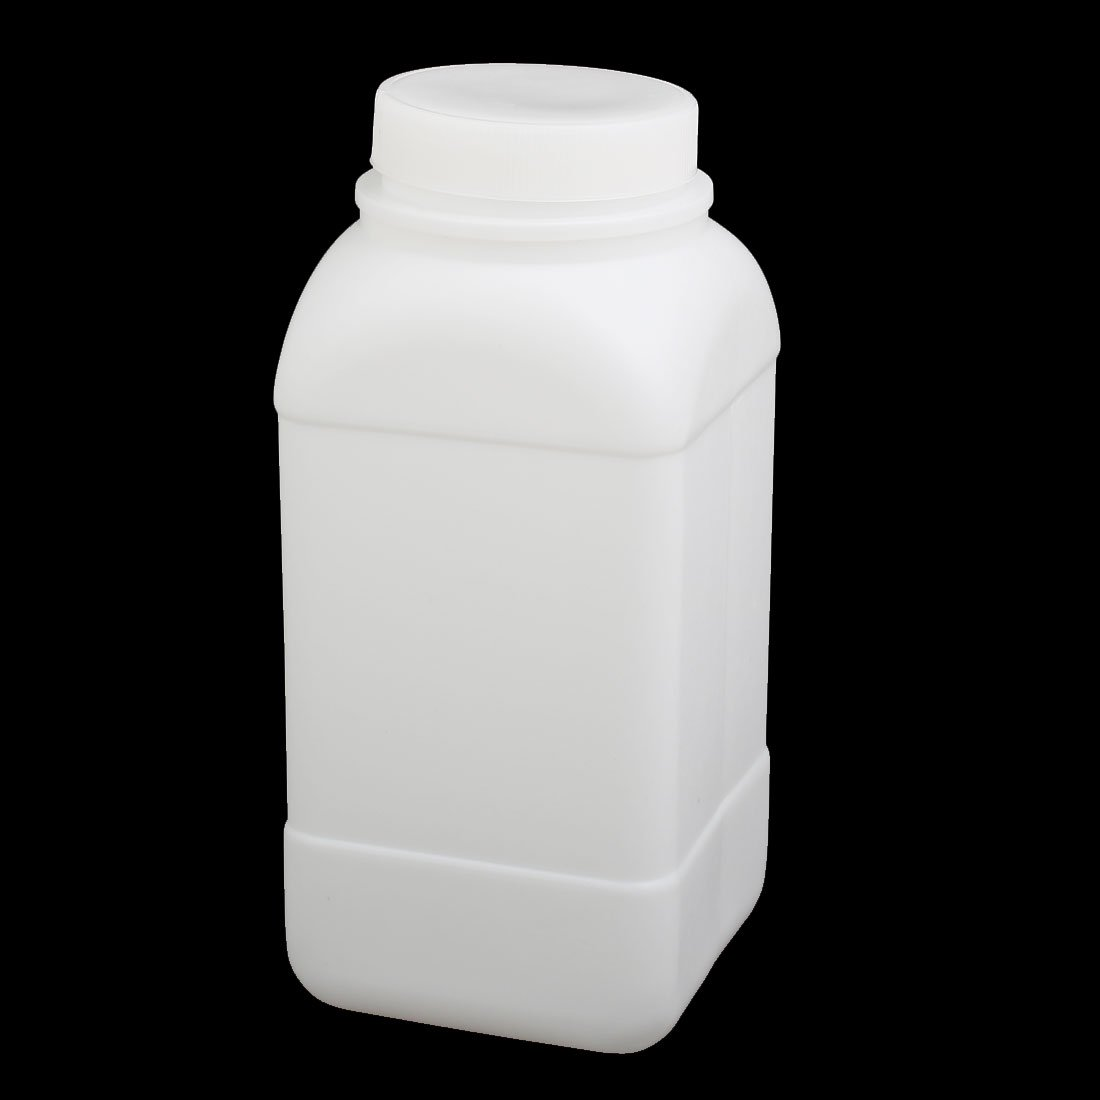 uxcell/® 5pcs 85mmx85mmx190mm 1000ml HDPE Plastic Rectangle Bottle White